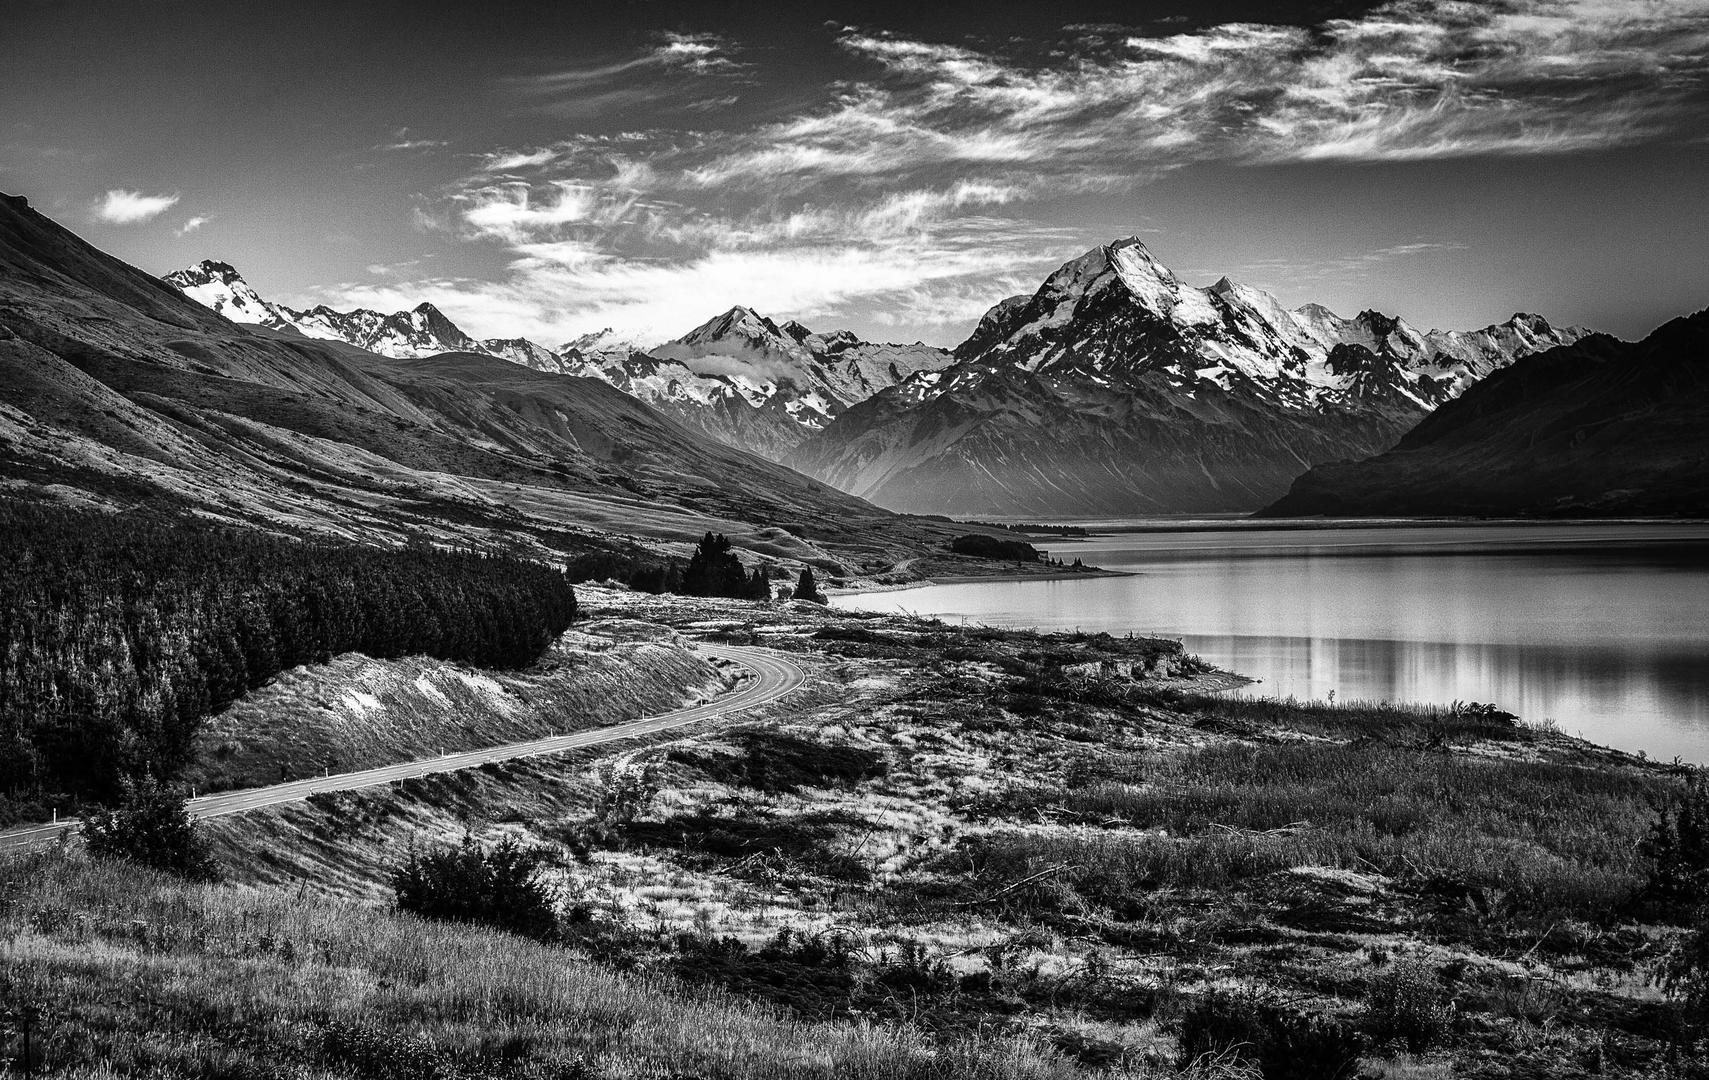 Дорога к горе Кук, © Дж. Моррисси, 3-е место, Фотоконкурс «Фотограф года от Digital Camera»